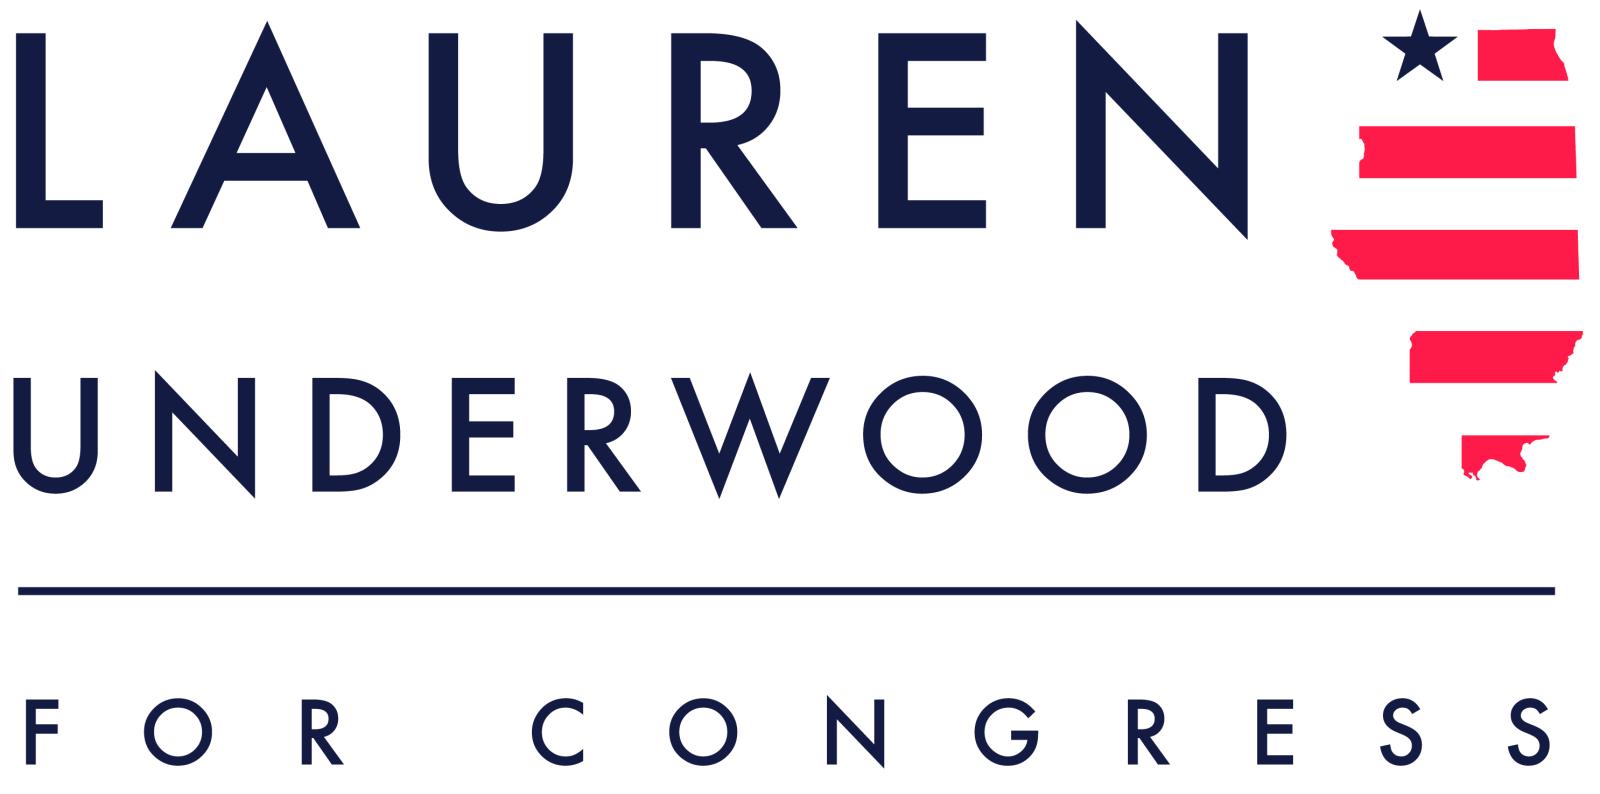 Image result for lauren underwood for congress logo